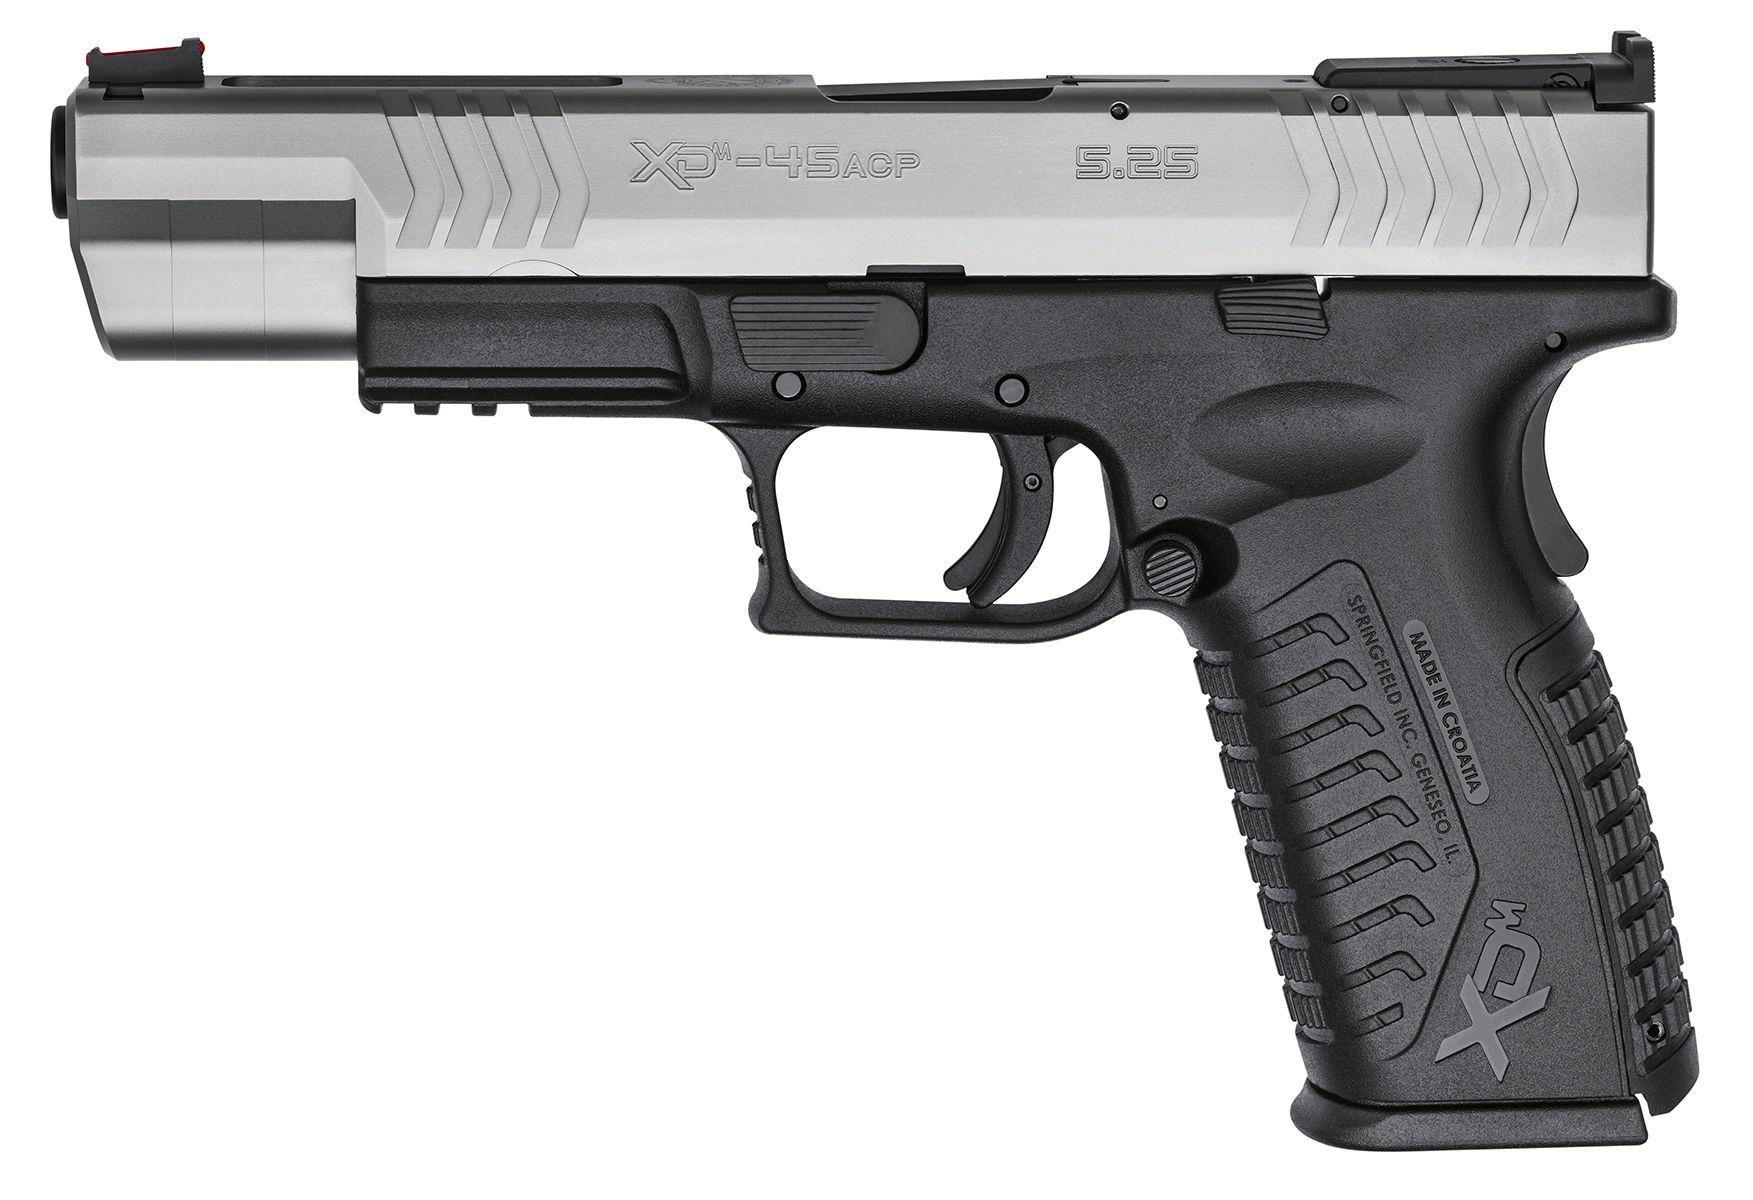 XD(M)® Competition Series .45ACP Handgun | Polymer Pistols